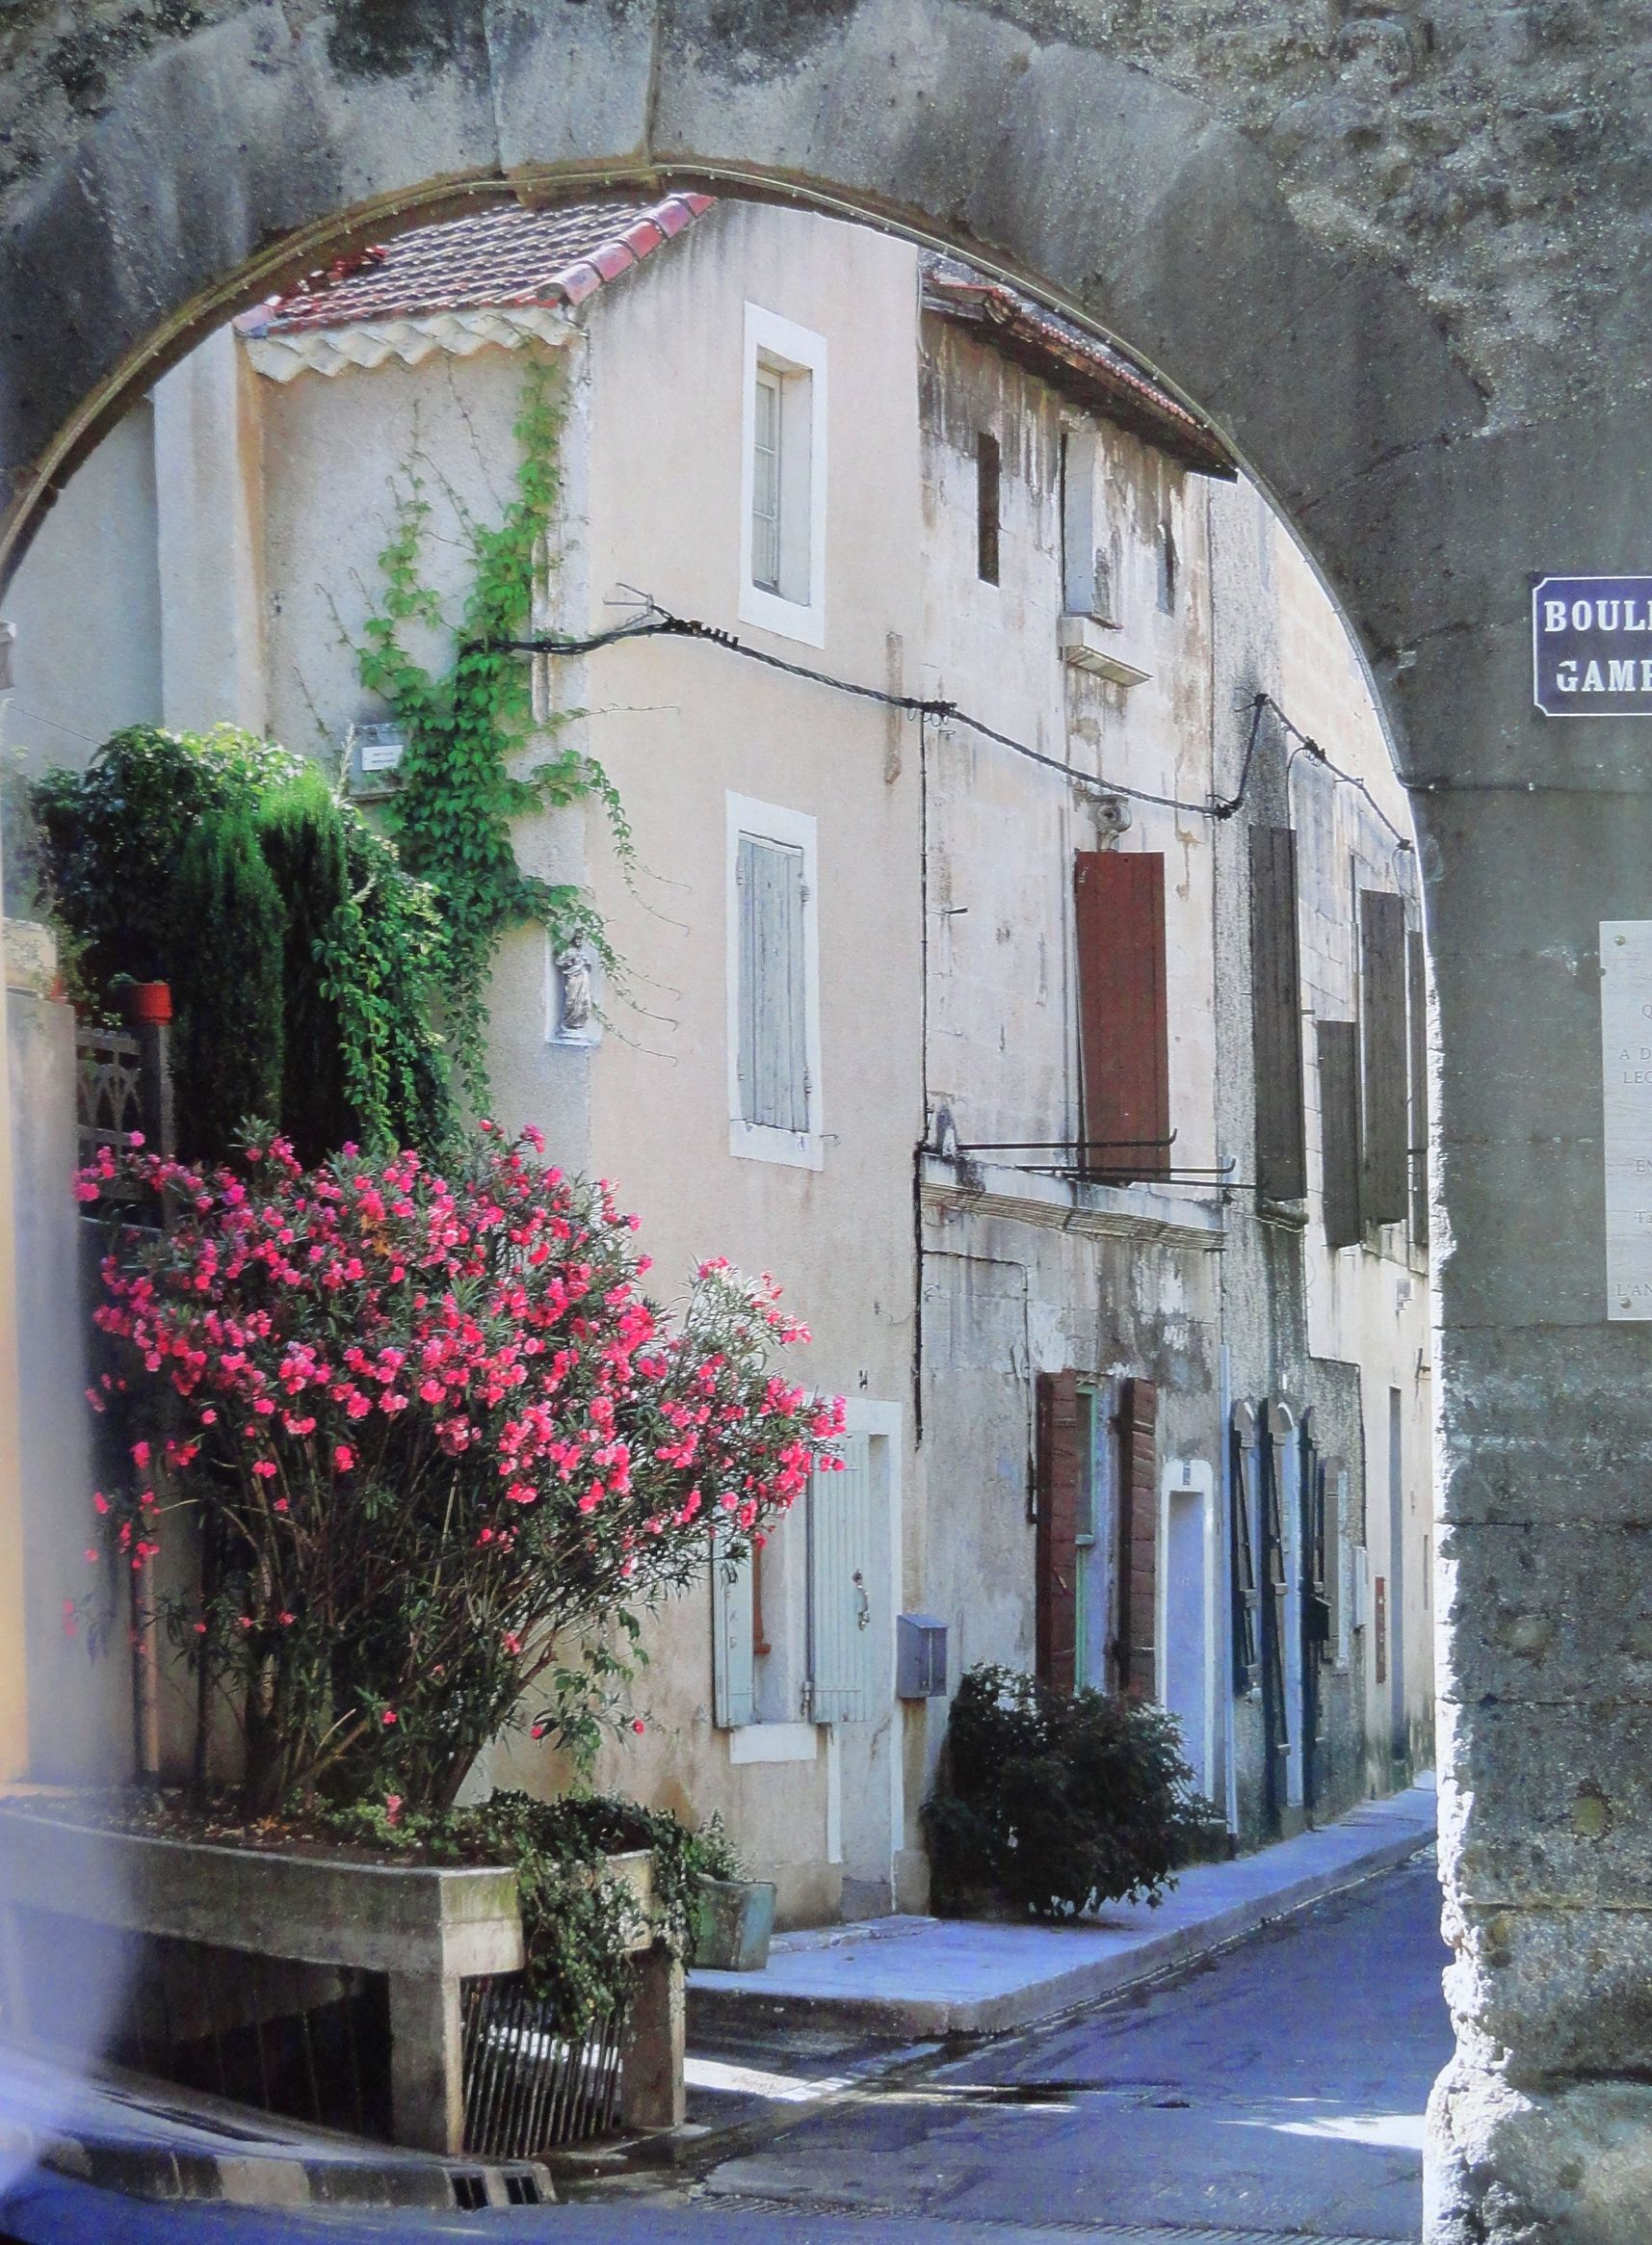 St Remy De Provence Provence France Travel France Travel Guide